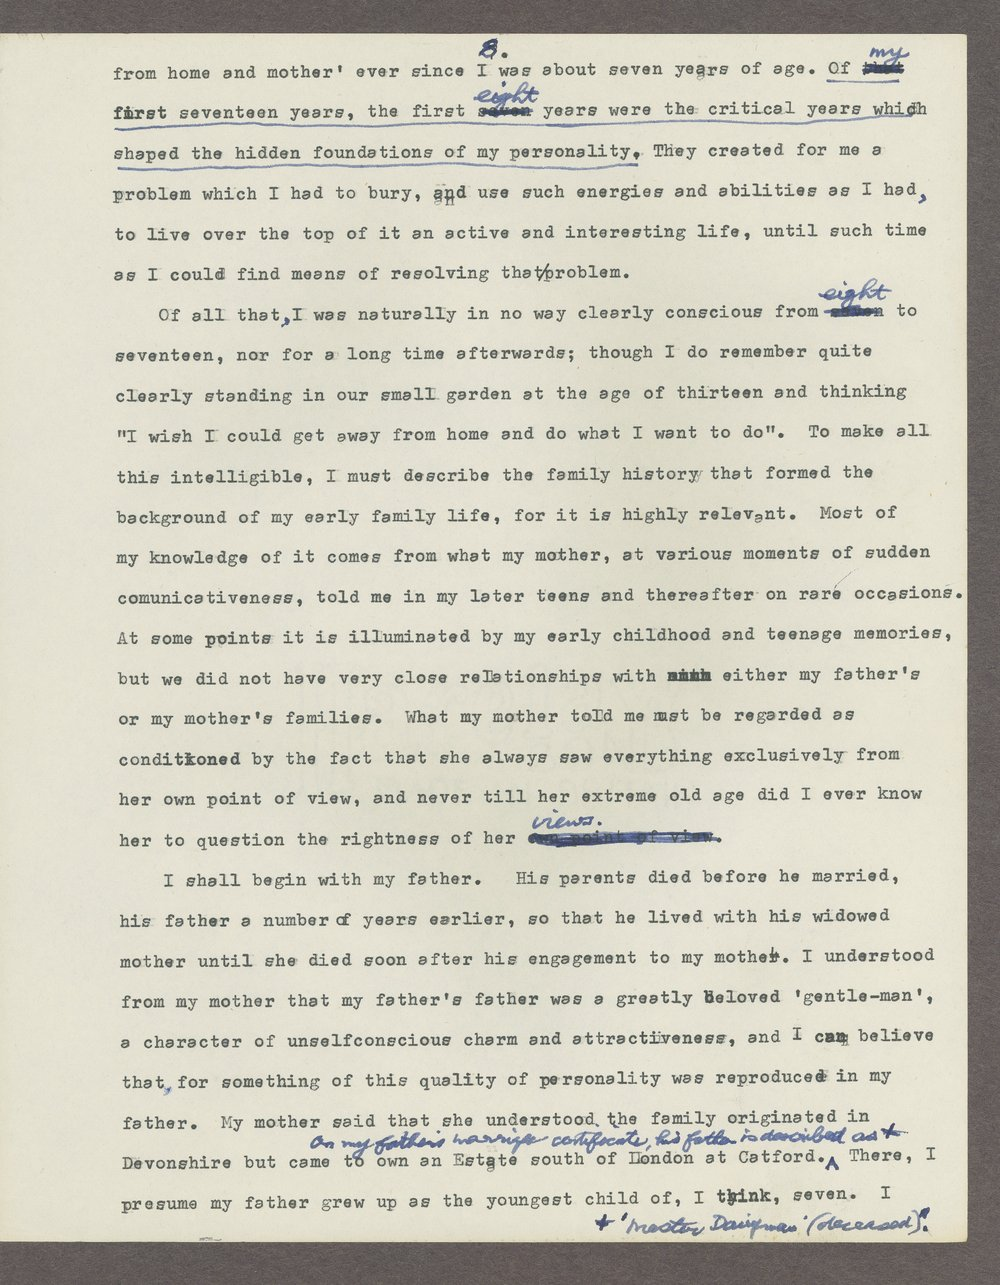 Harry Guntrip manuscripts - 2